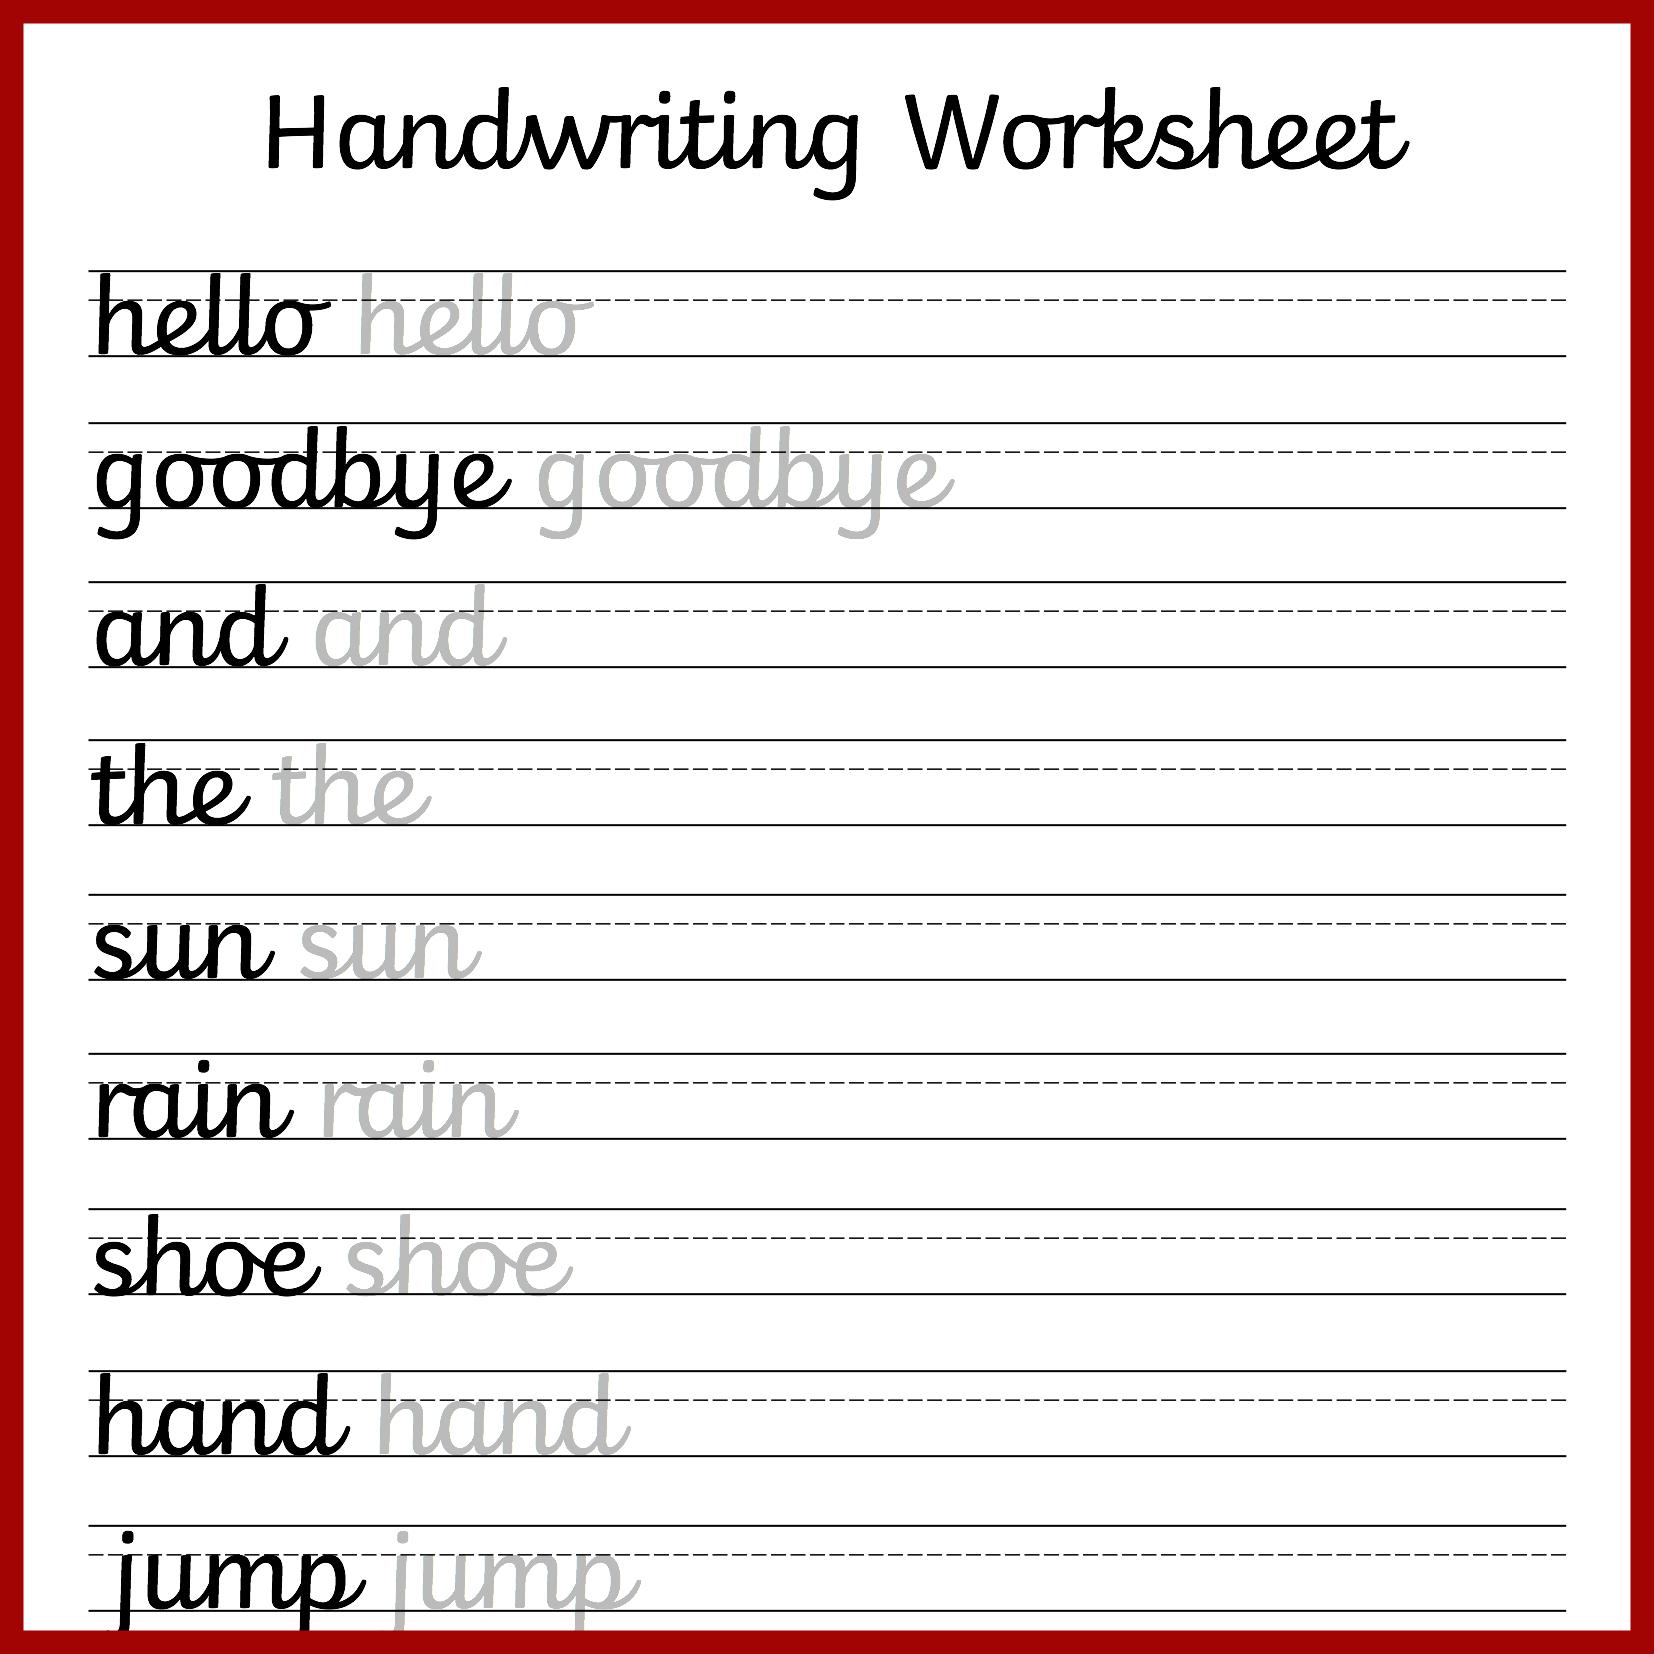 Cursive Handwriting Worksheets – Free Printable! ⋆ Mama Geek - Free | Printable Penmanship Worksheets